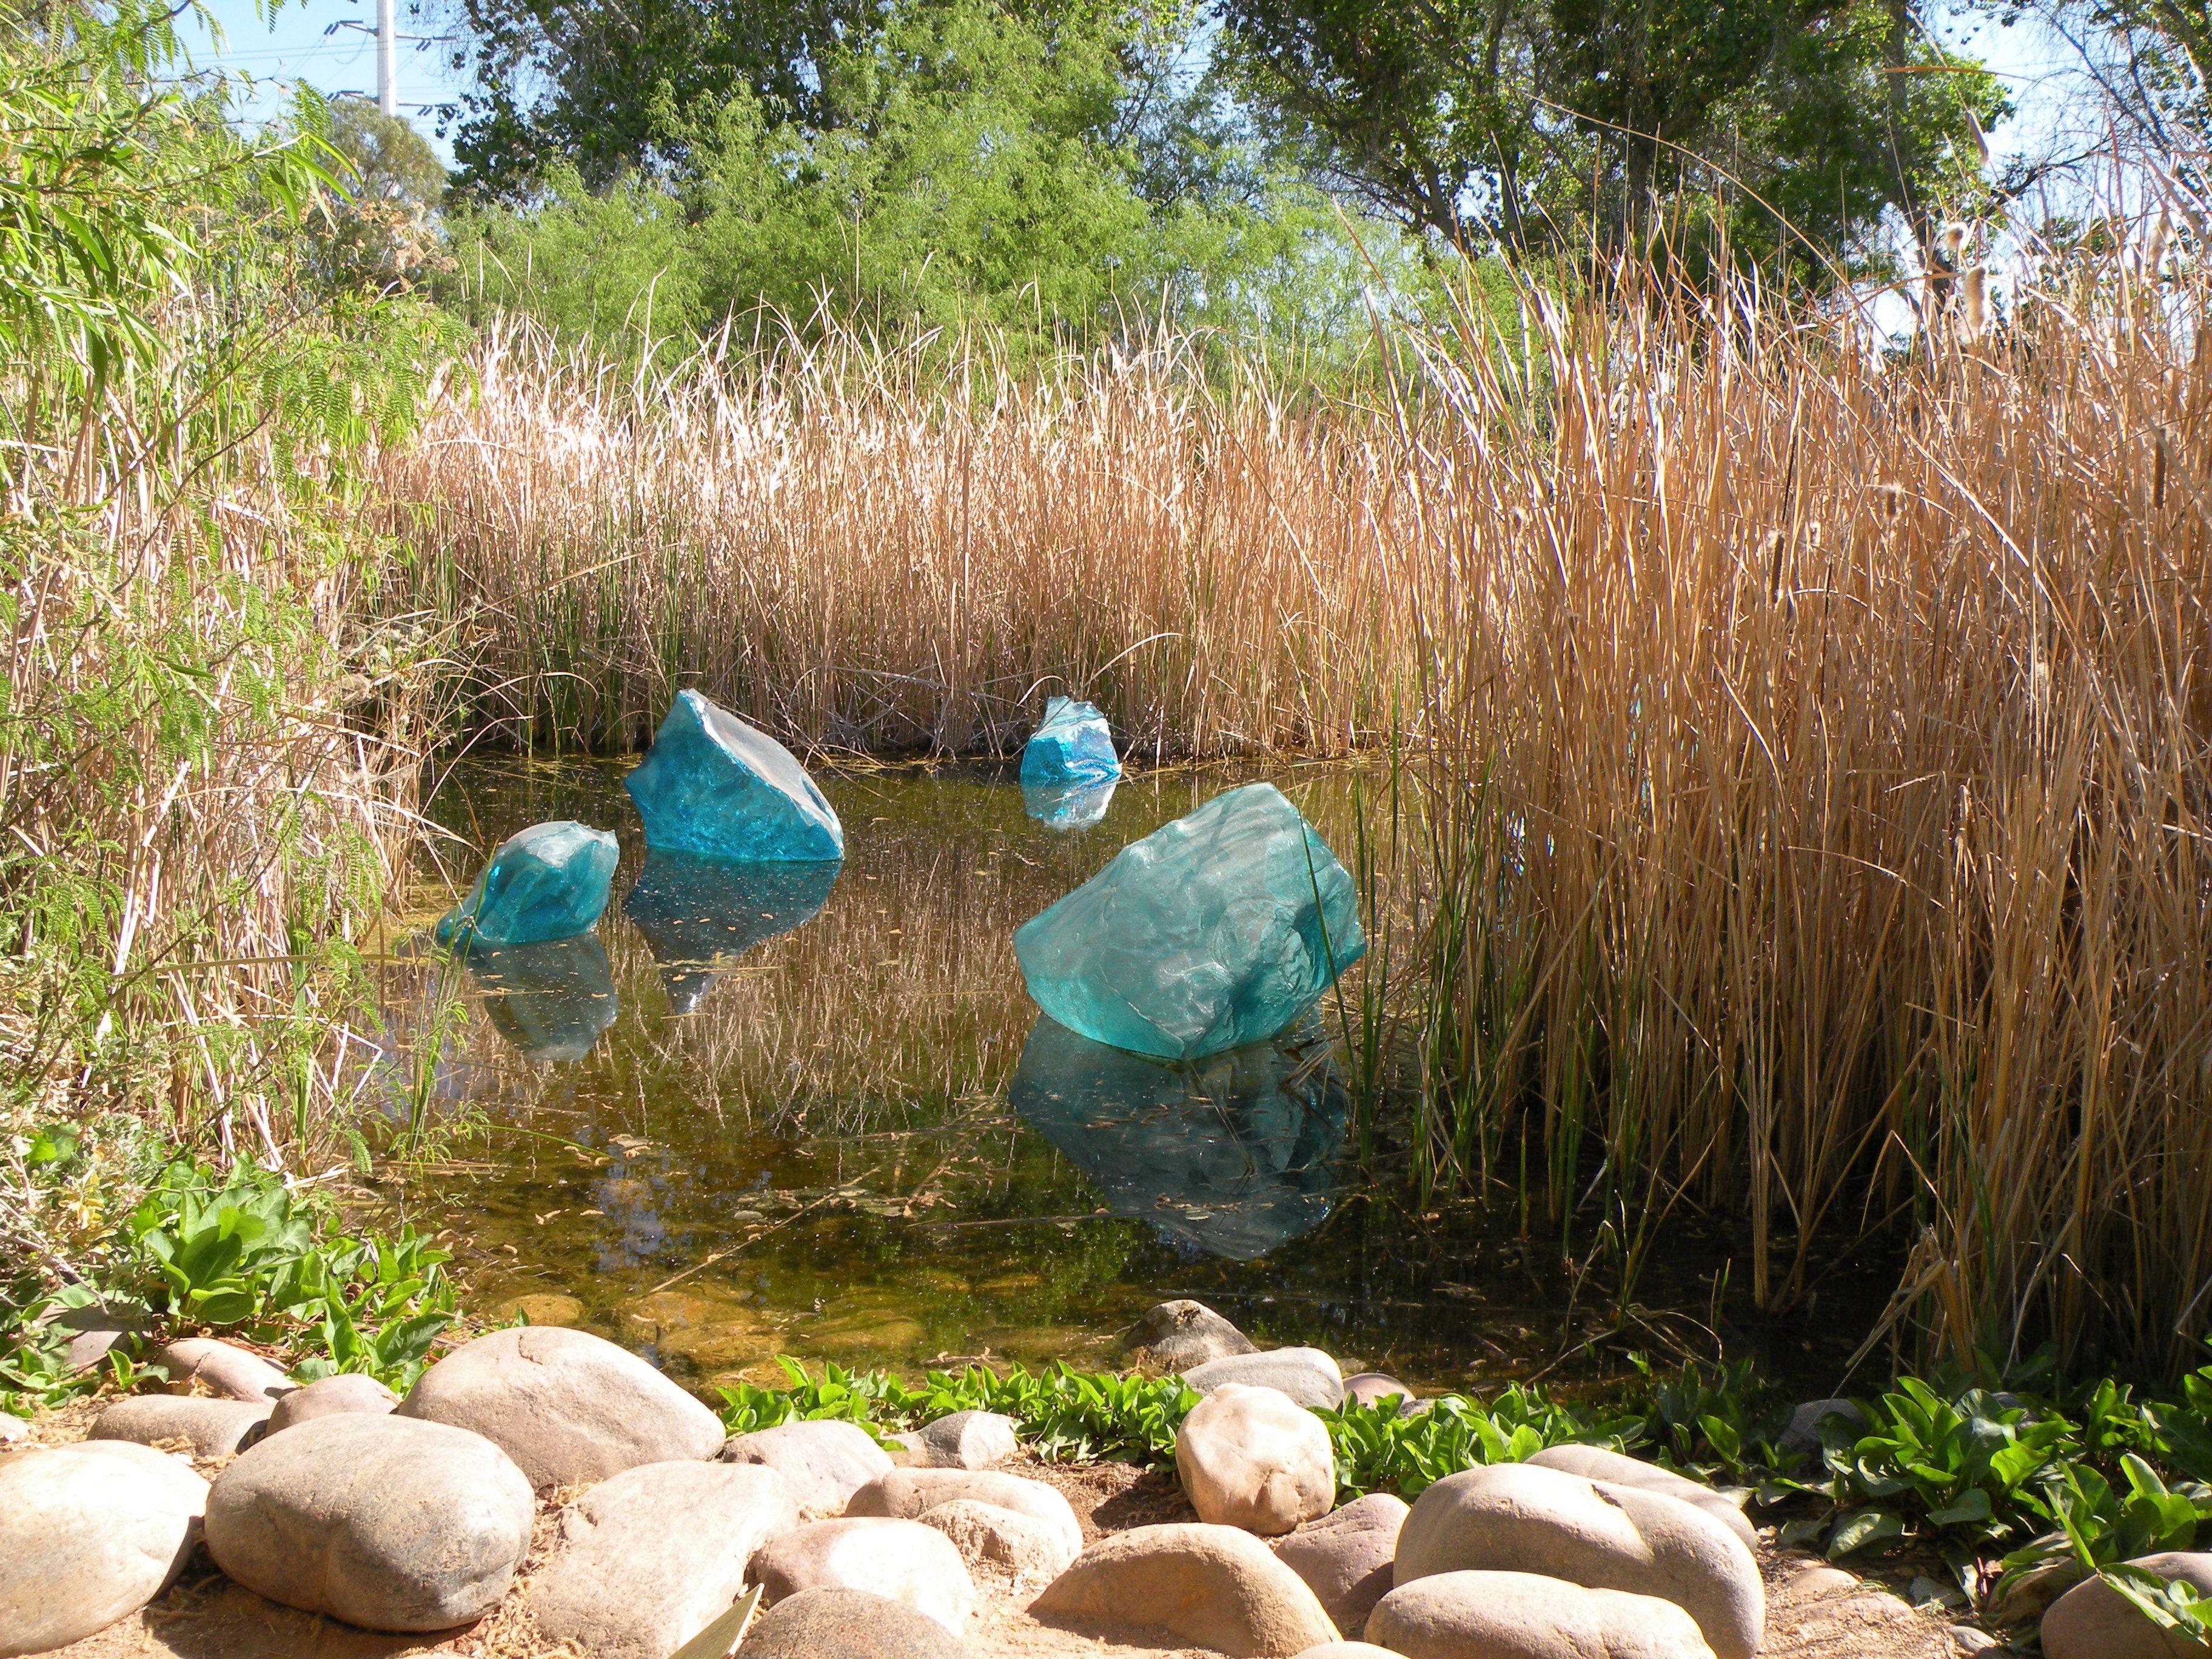 Ice - Chihuly, Phoenix Botanical Garden | Greenland - Decorative ...